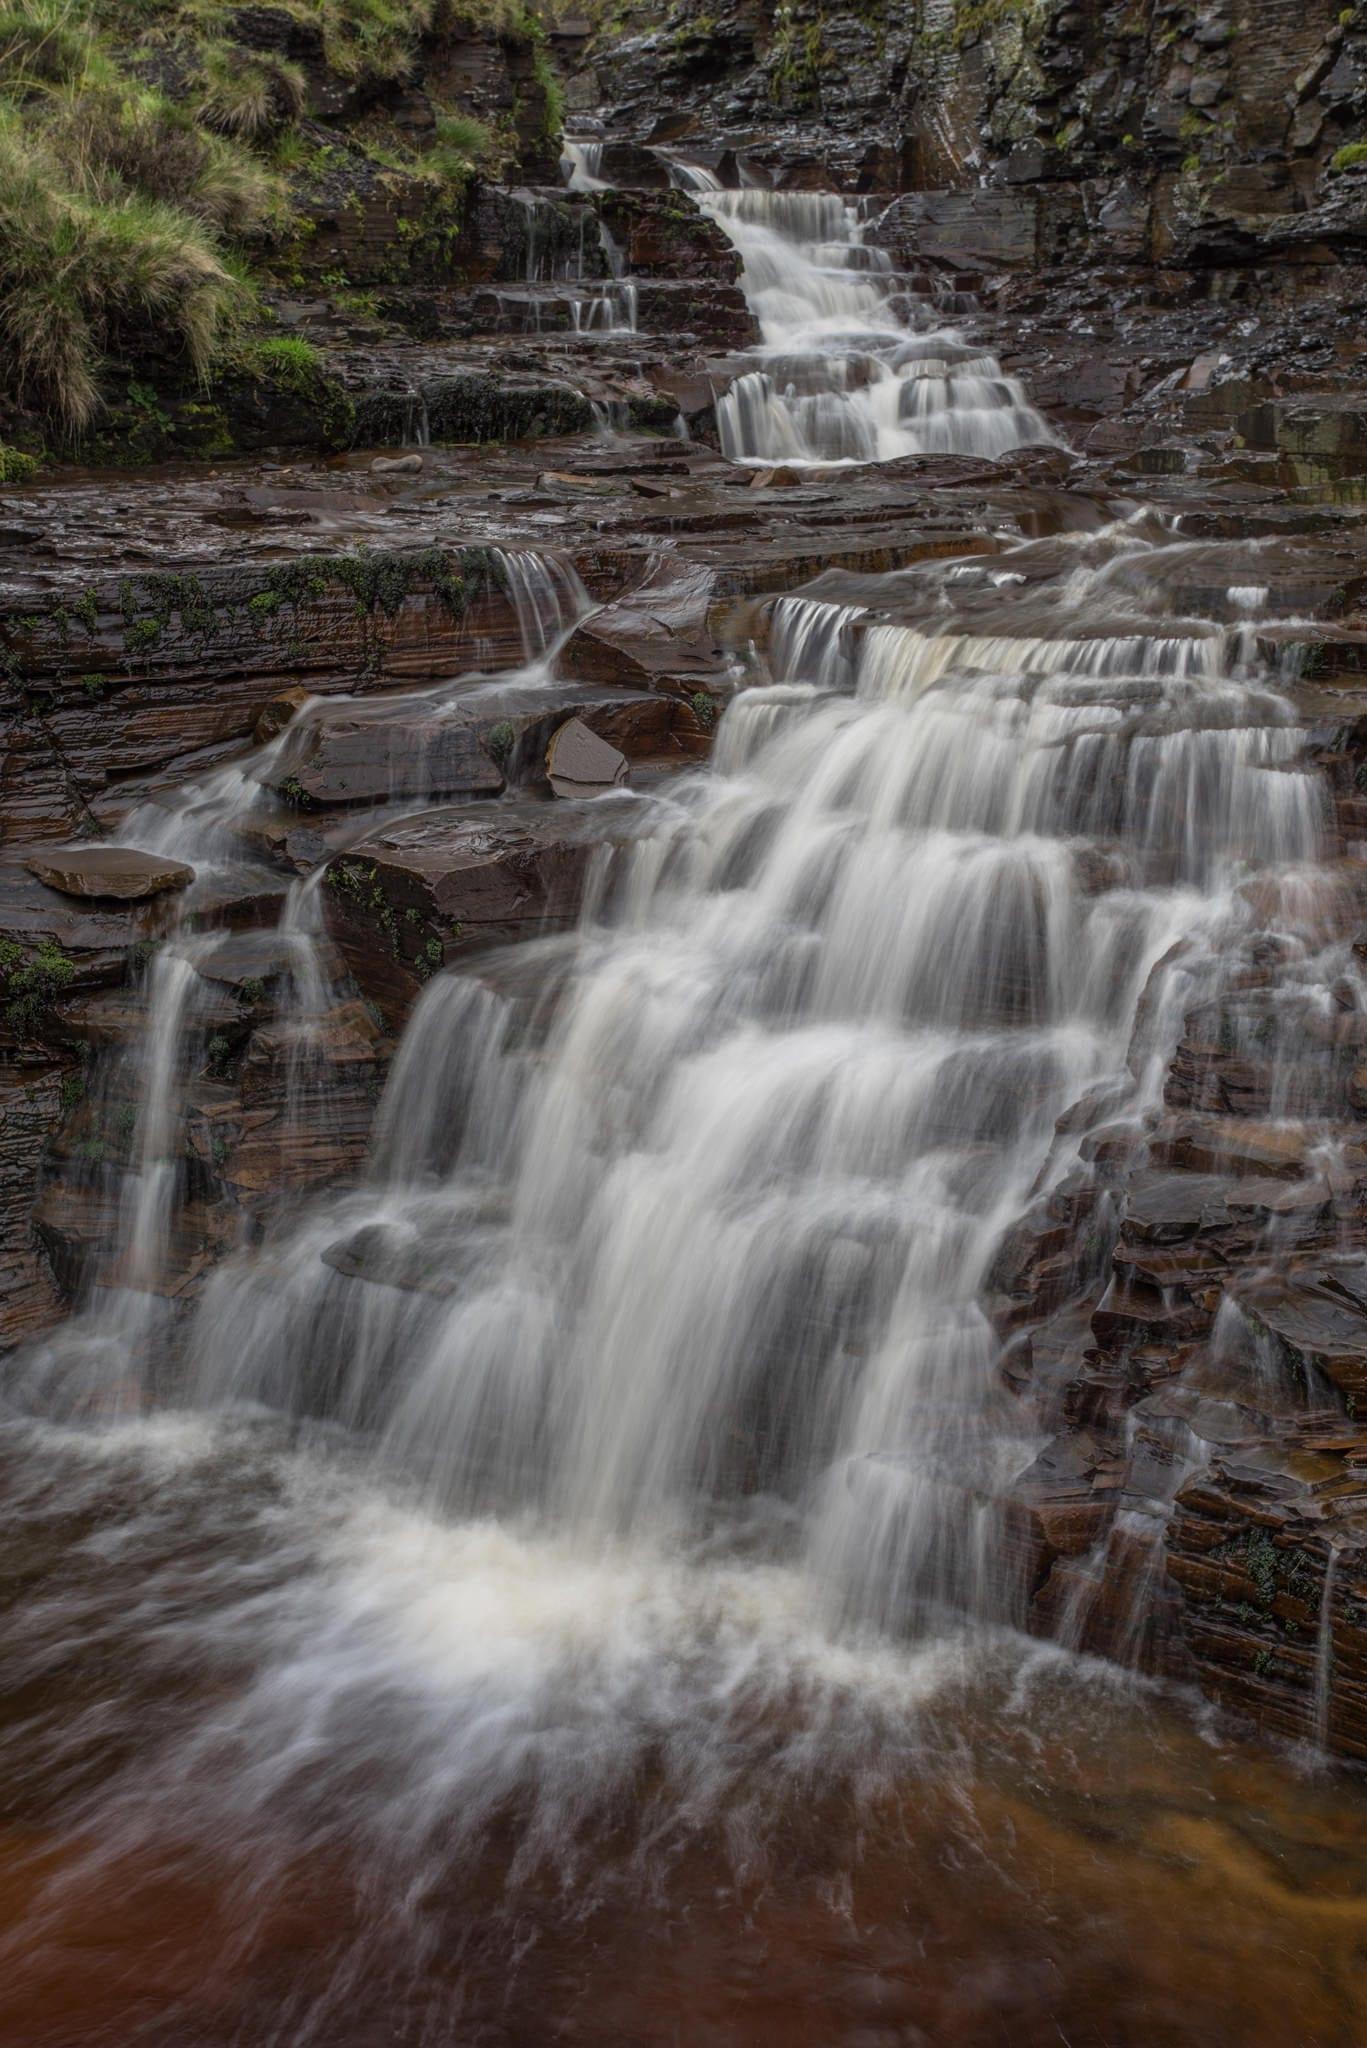 Grindsbrook Clough Waterfall - Kinder Scout Photography Workshop